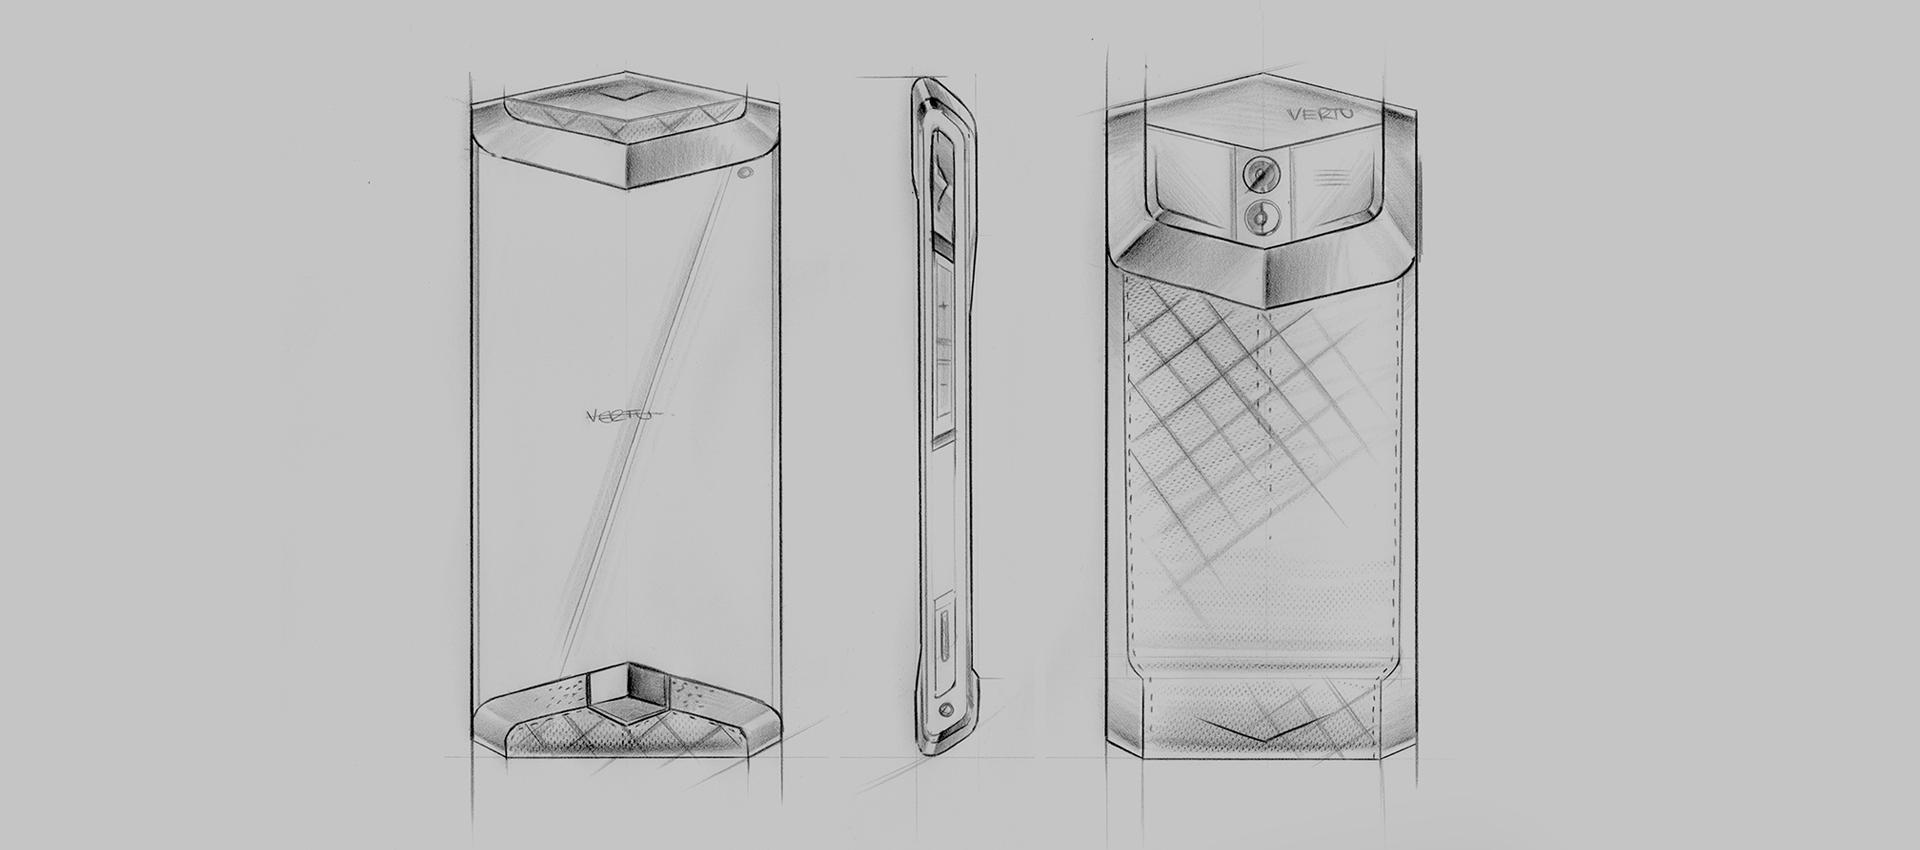 Vertu Venus | Development sketches